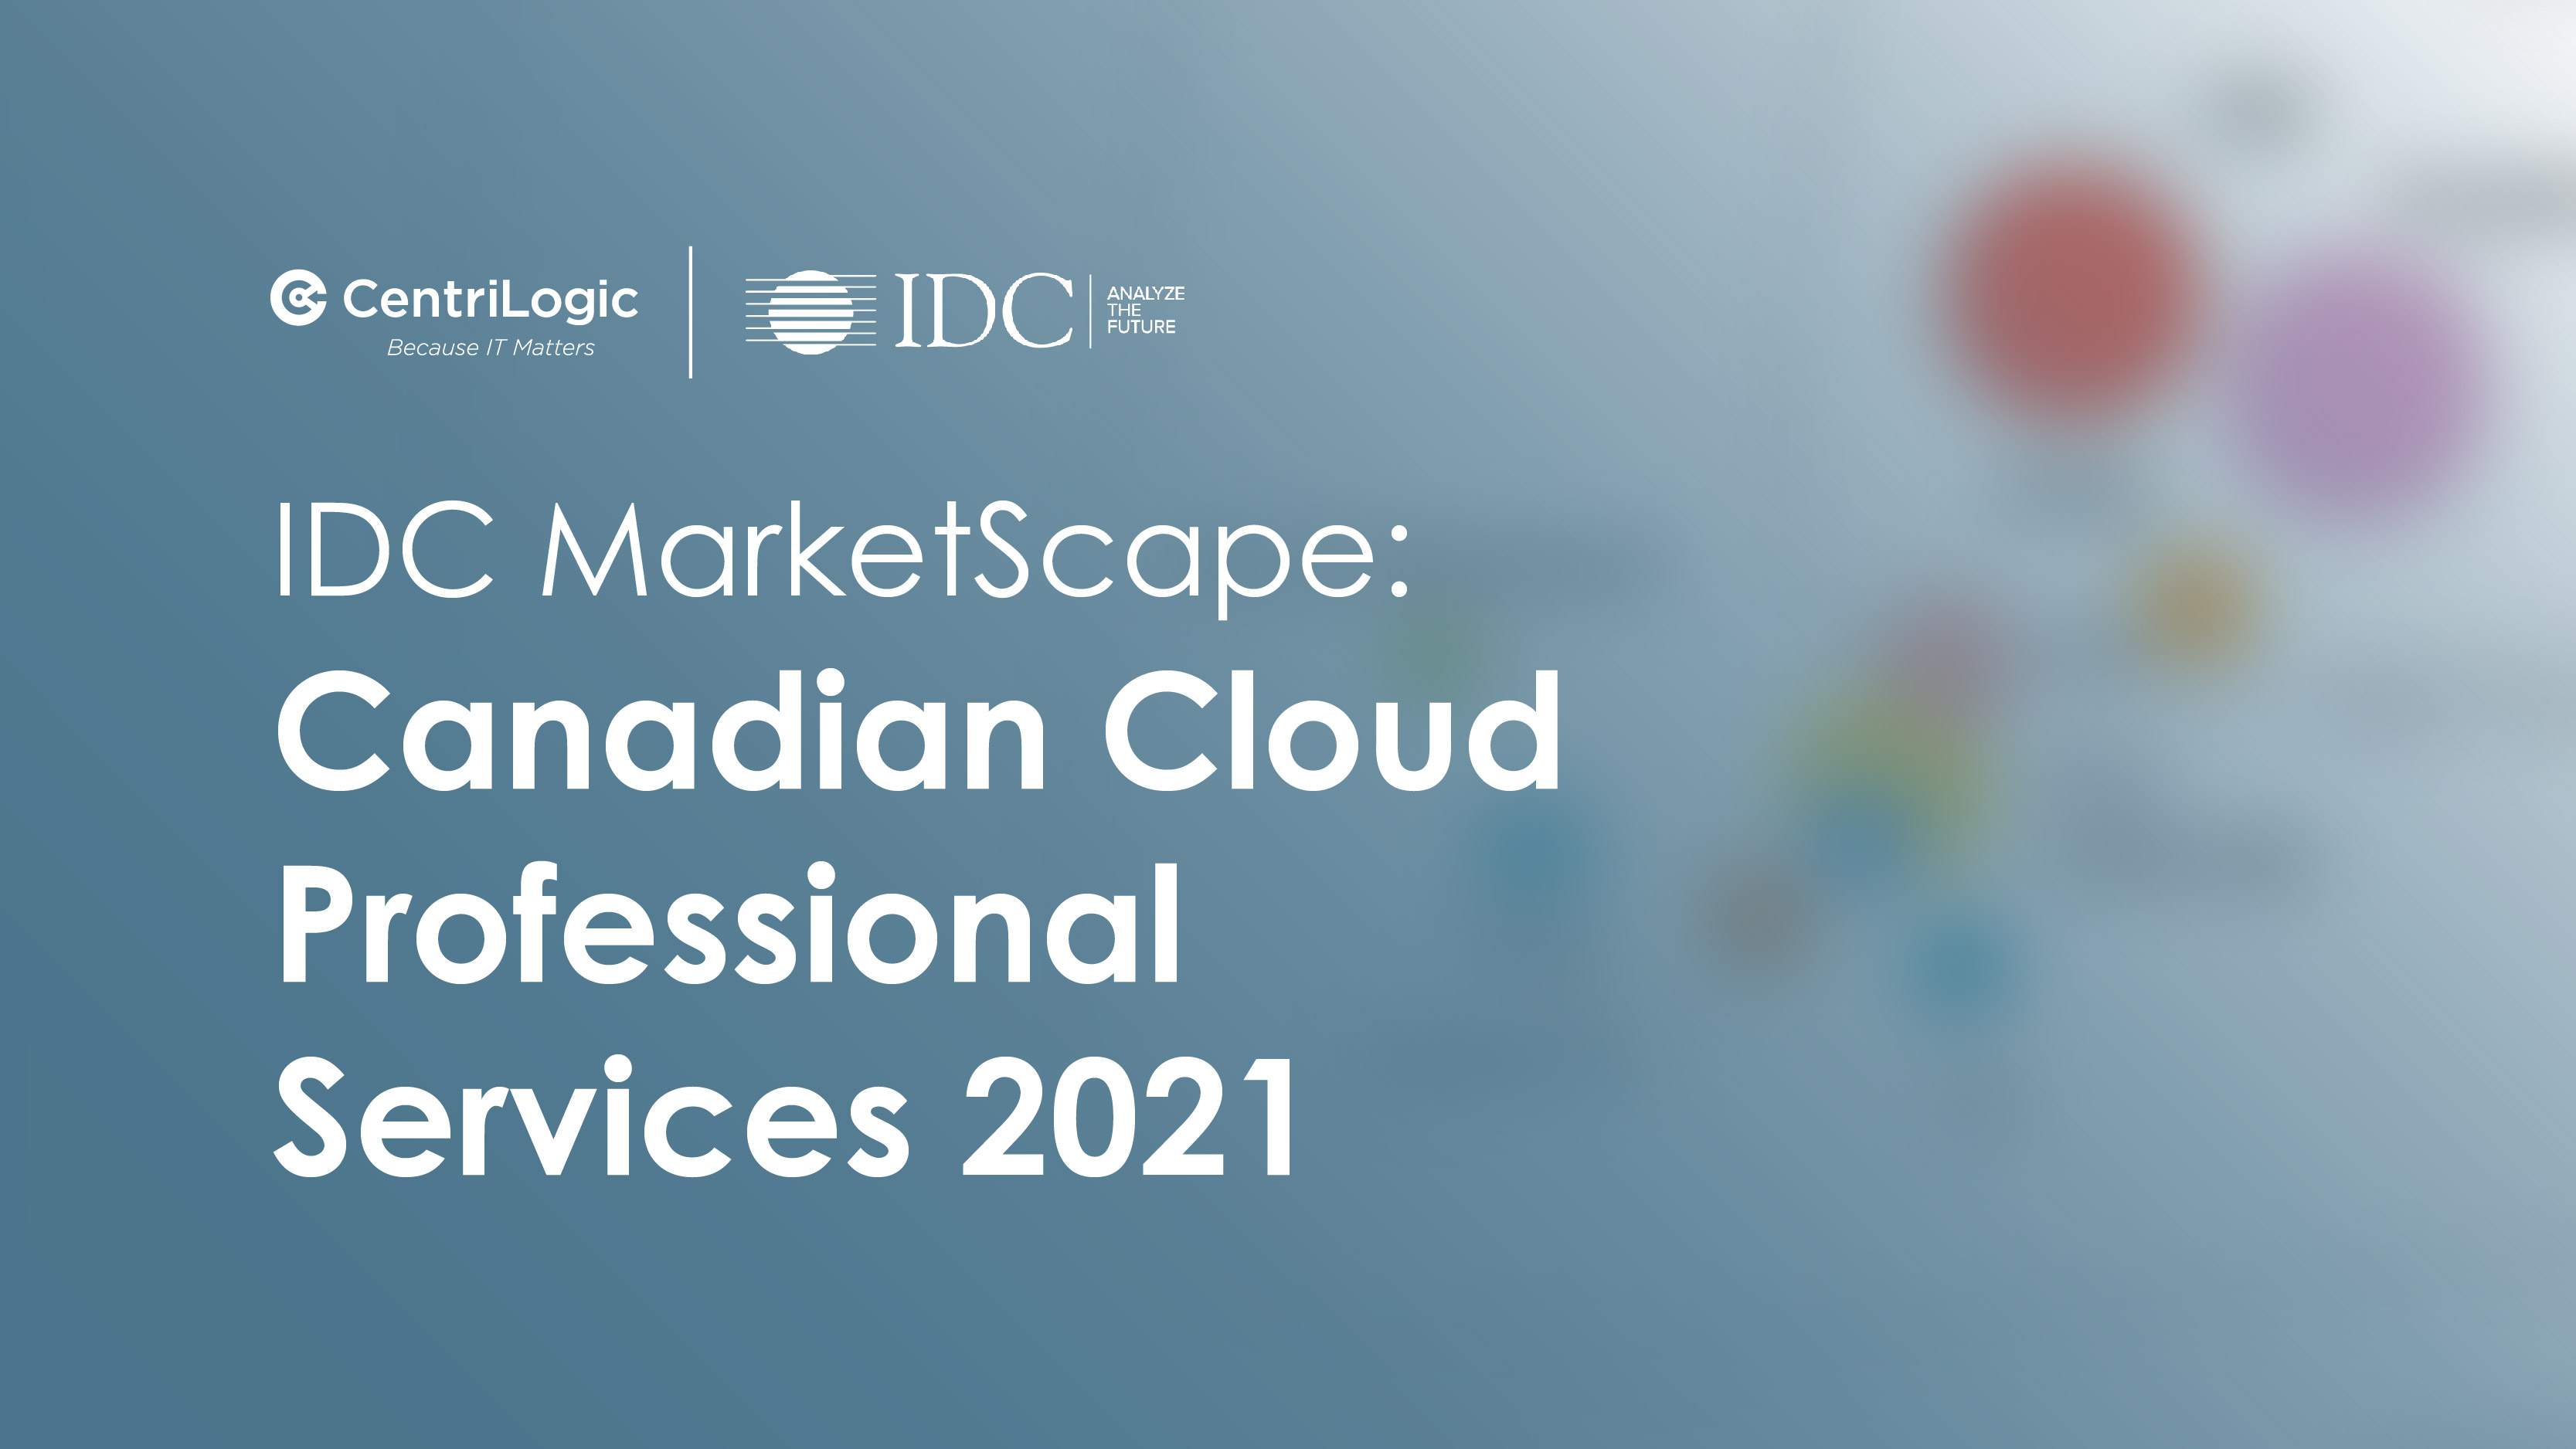 IDC MarketScape: Canadian Cloud Professional Services 2021 Report